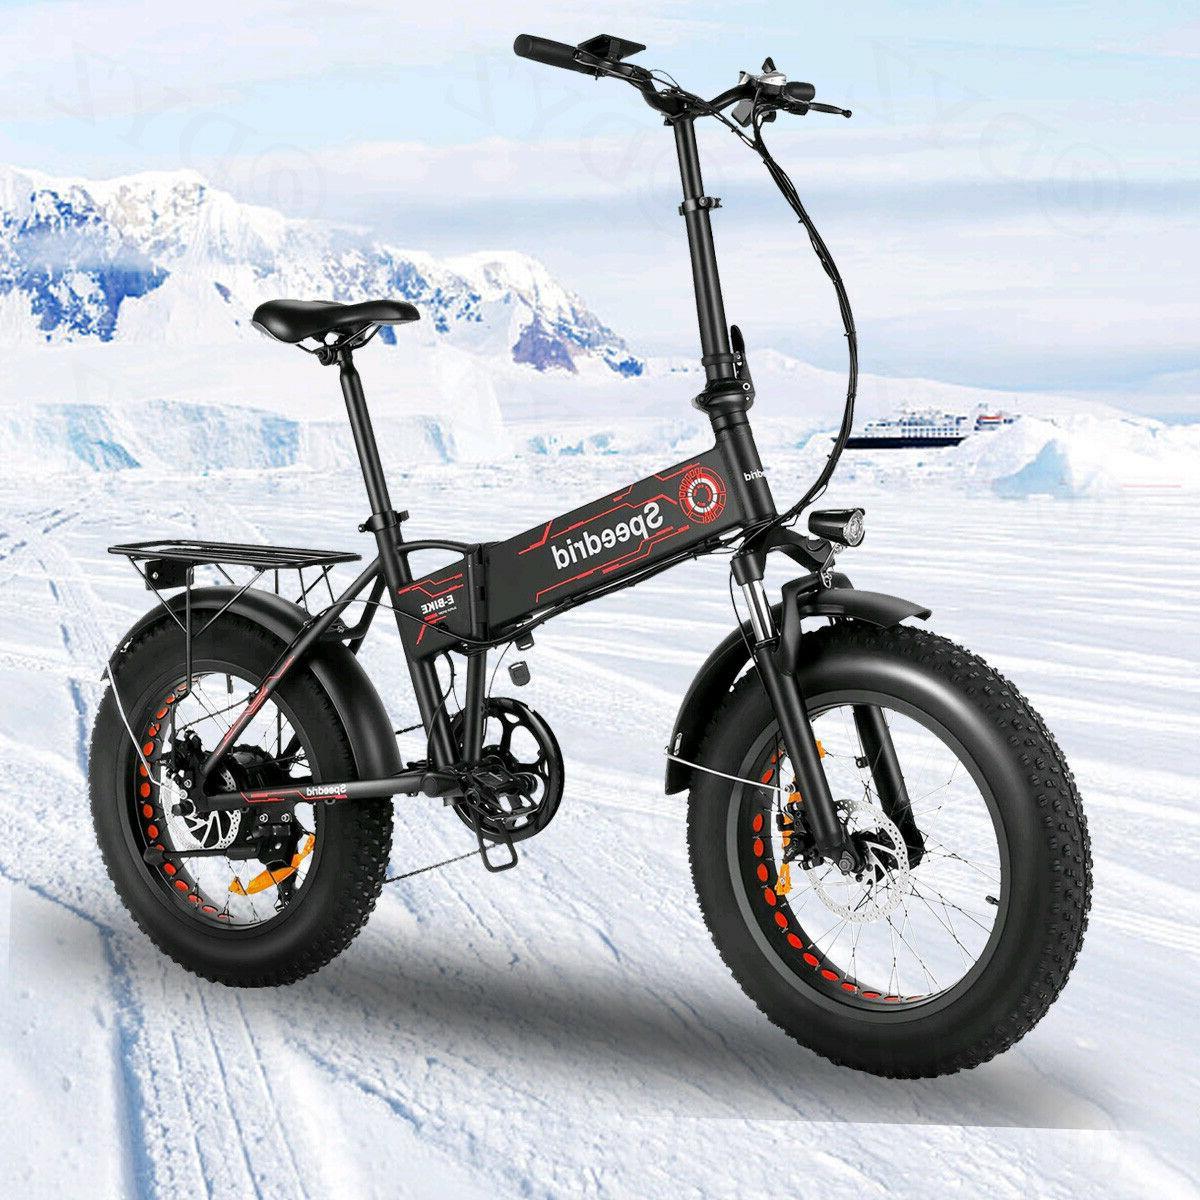 20INCH 500W Folding Mountain Bicycle 12Ah